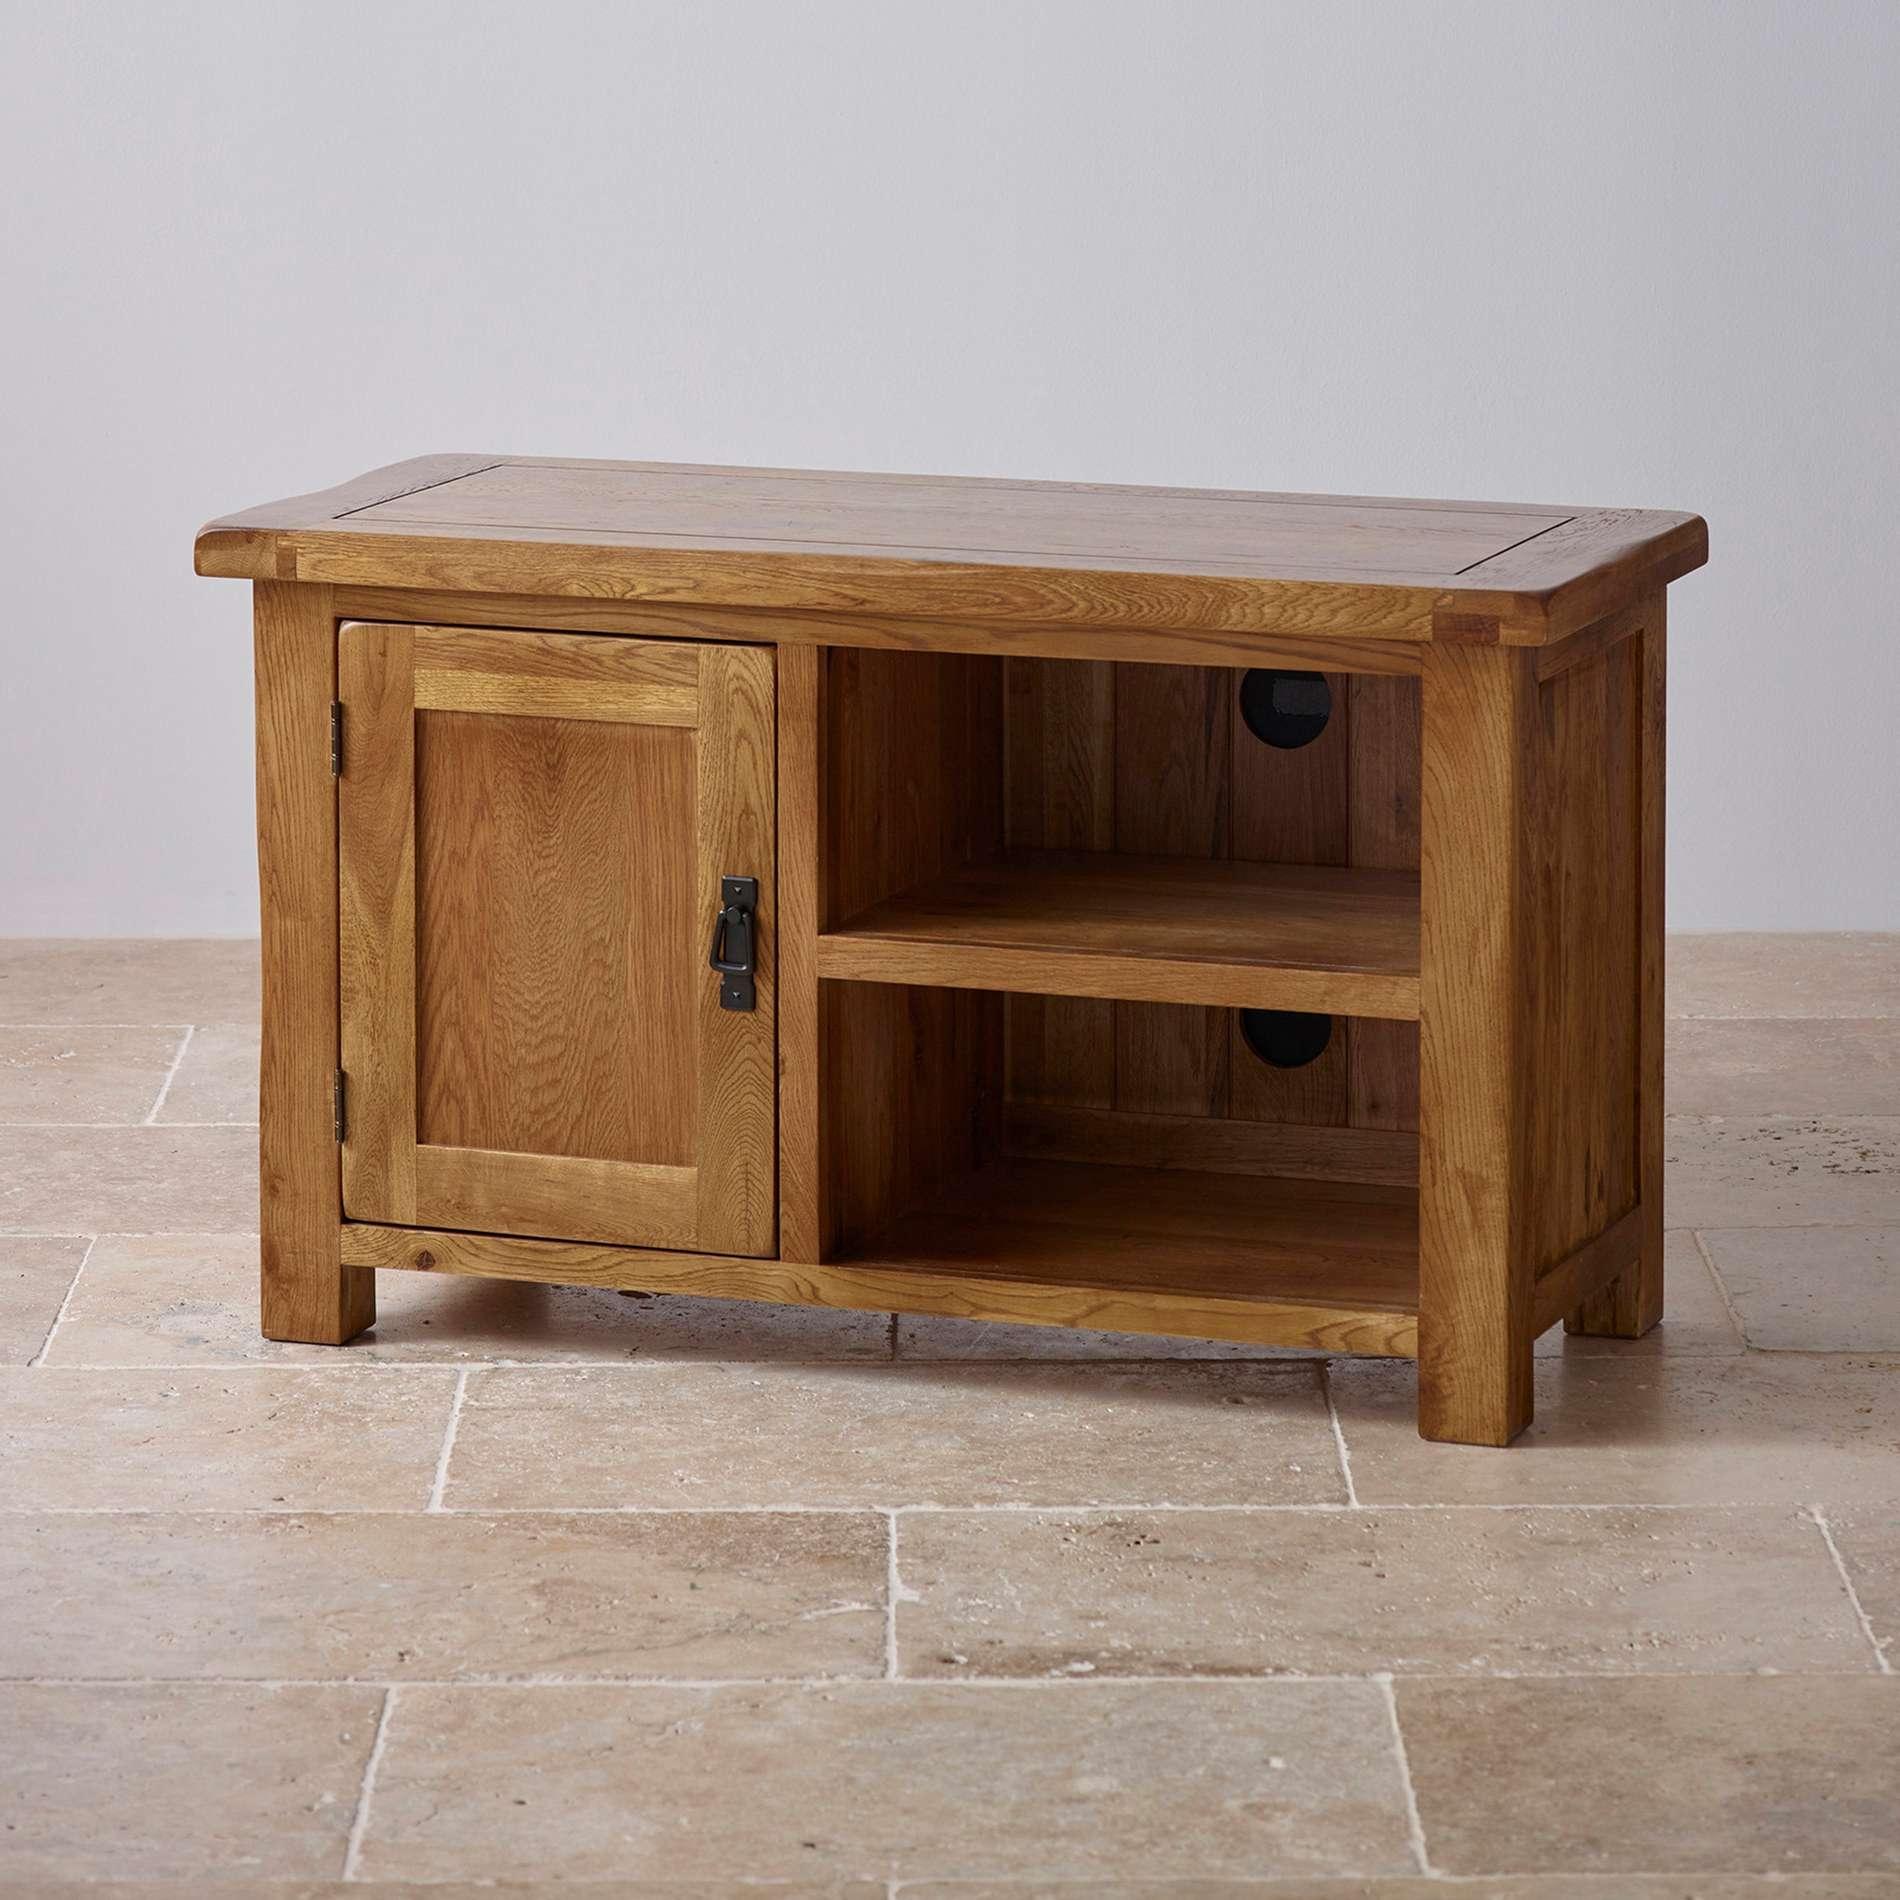 Original Rustic Range | Solid Oak | Oak Furniture Land Pertaining To Oak Tv Cabinets With Doors (Gallery 11 of 20)